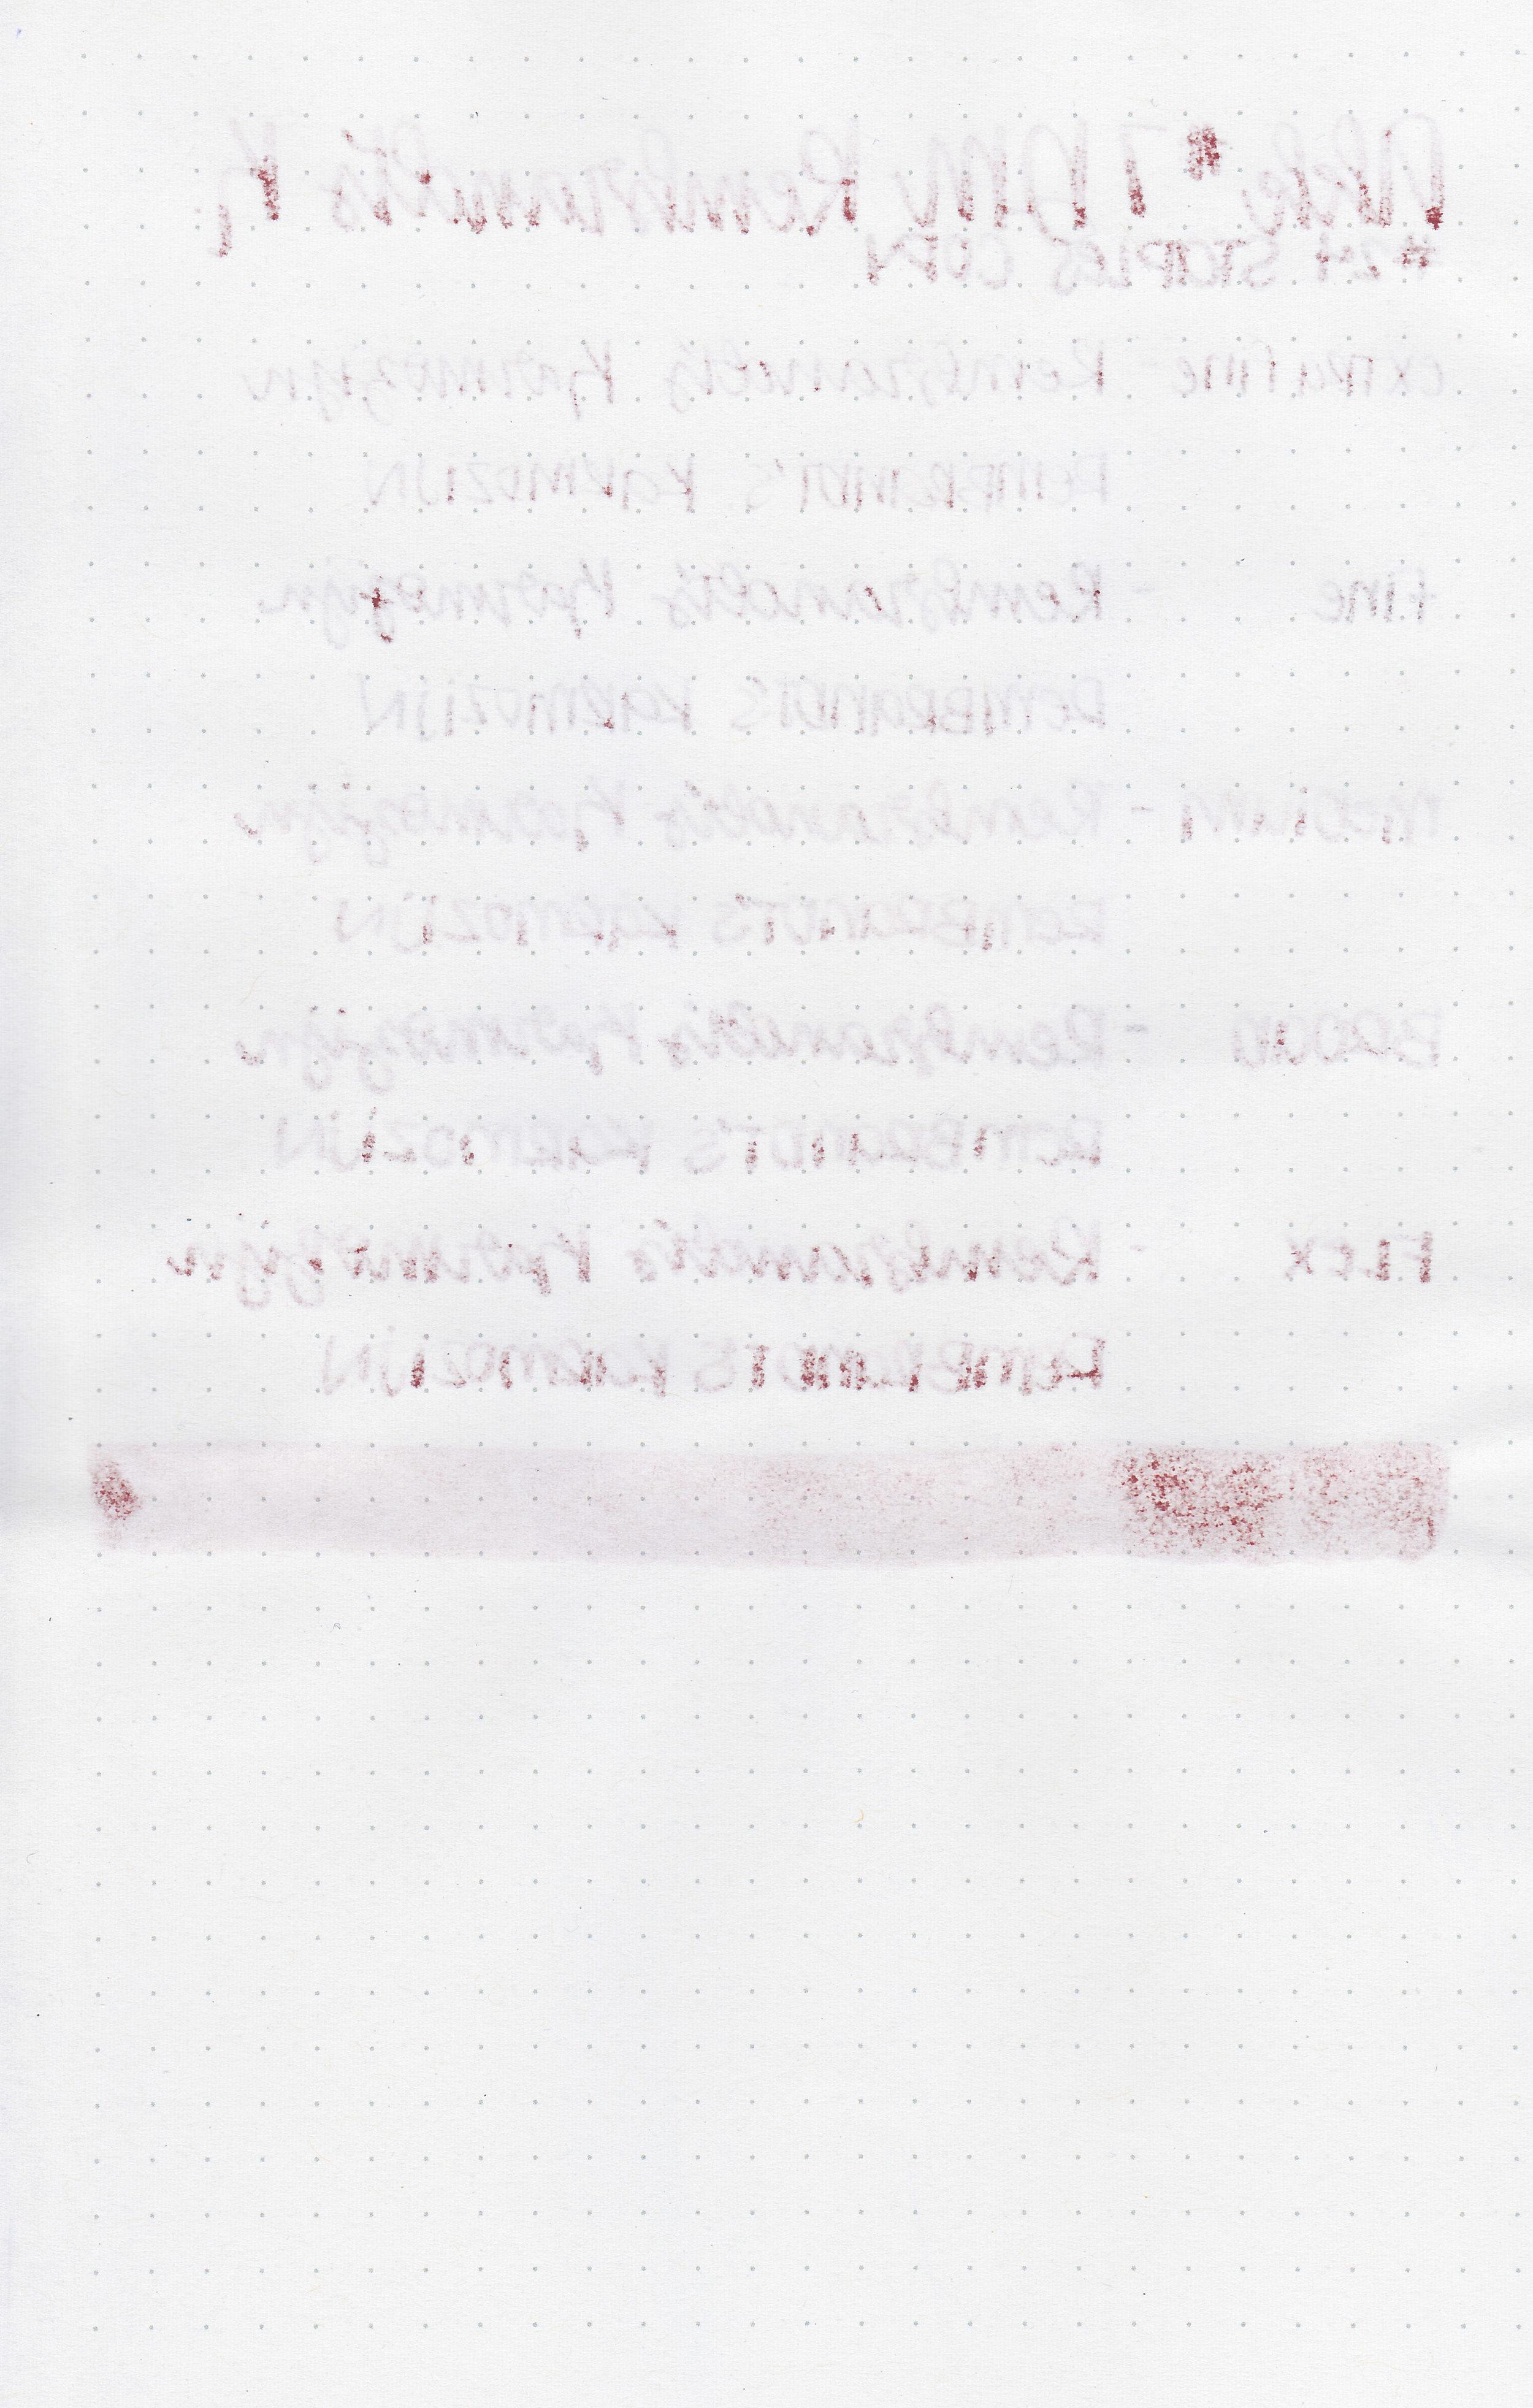 akk-7-rembrandt-10.jpg